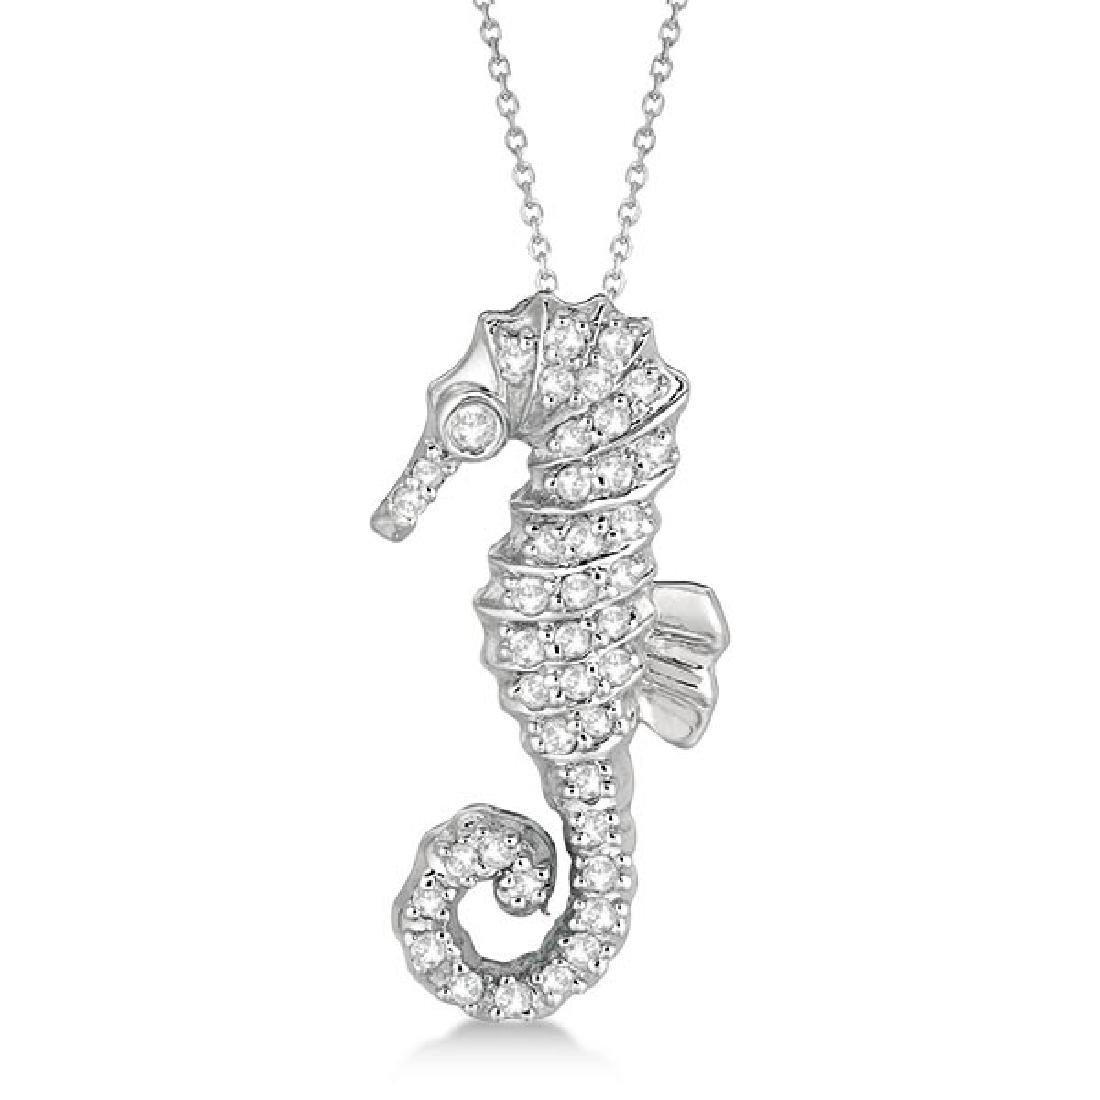 Diamond Seahorse Pendant Necklace 14k White Gold (0.29c